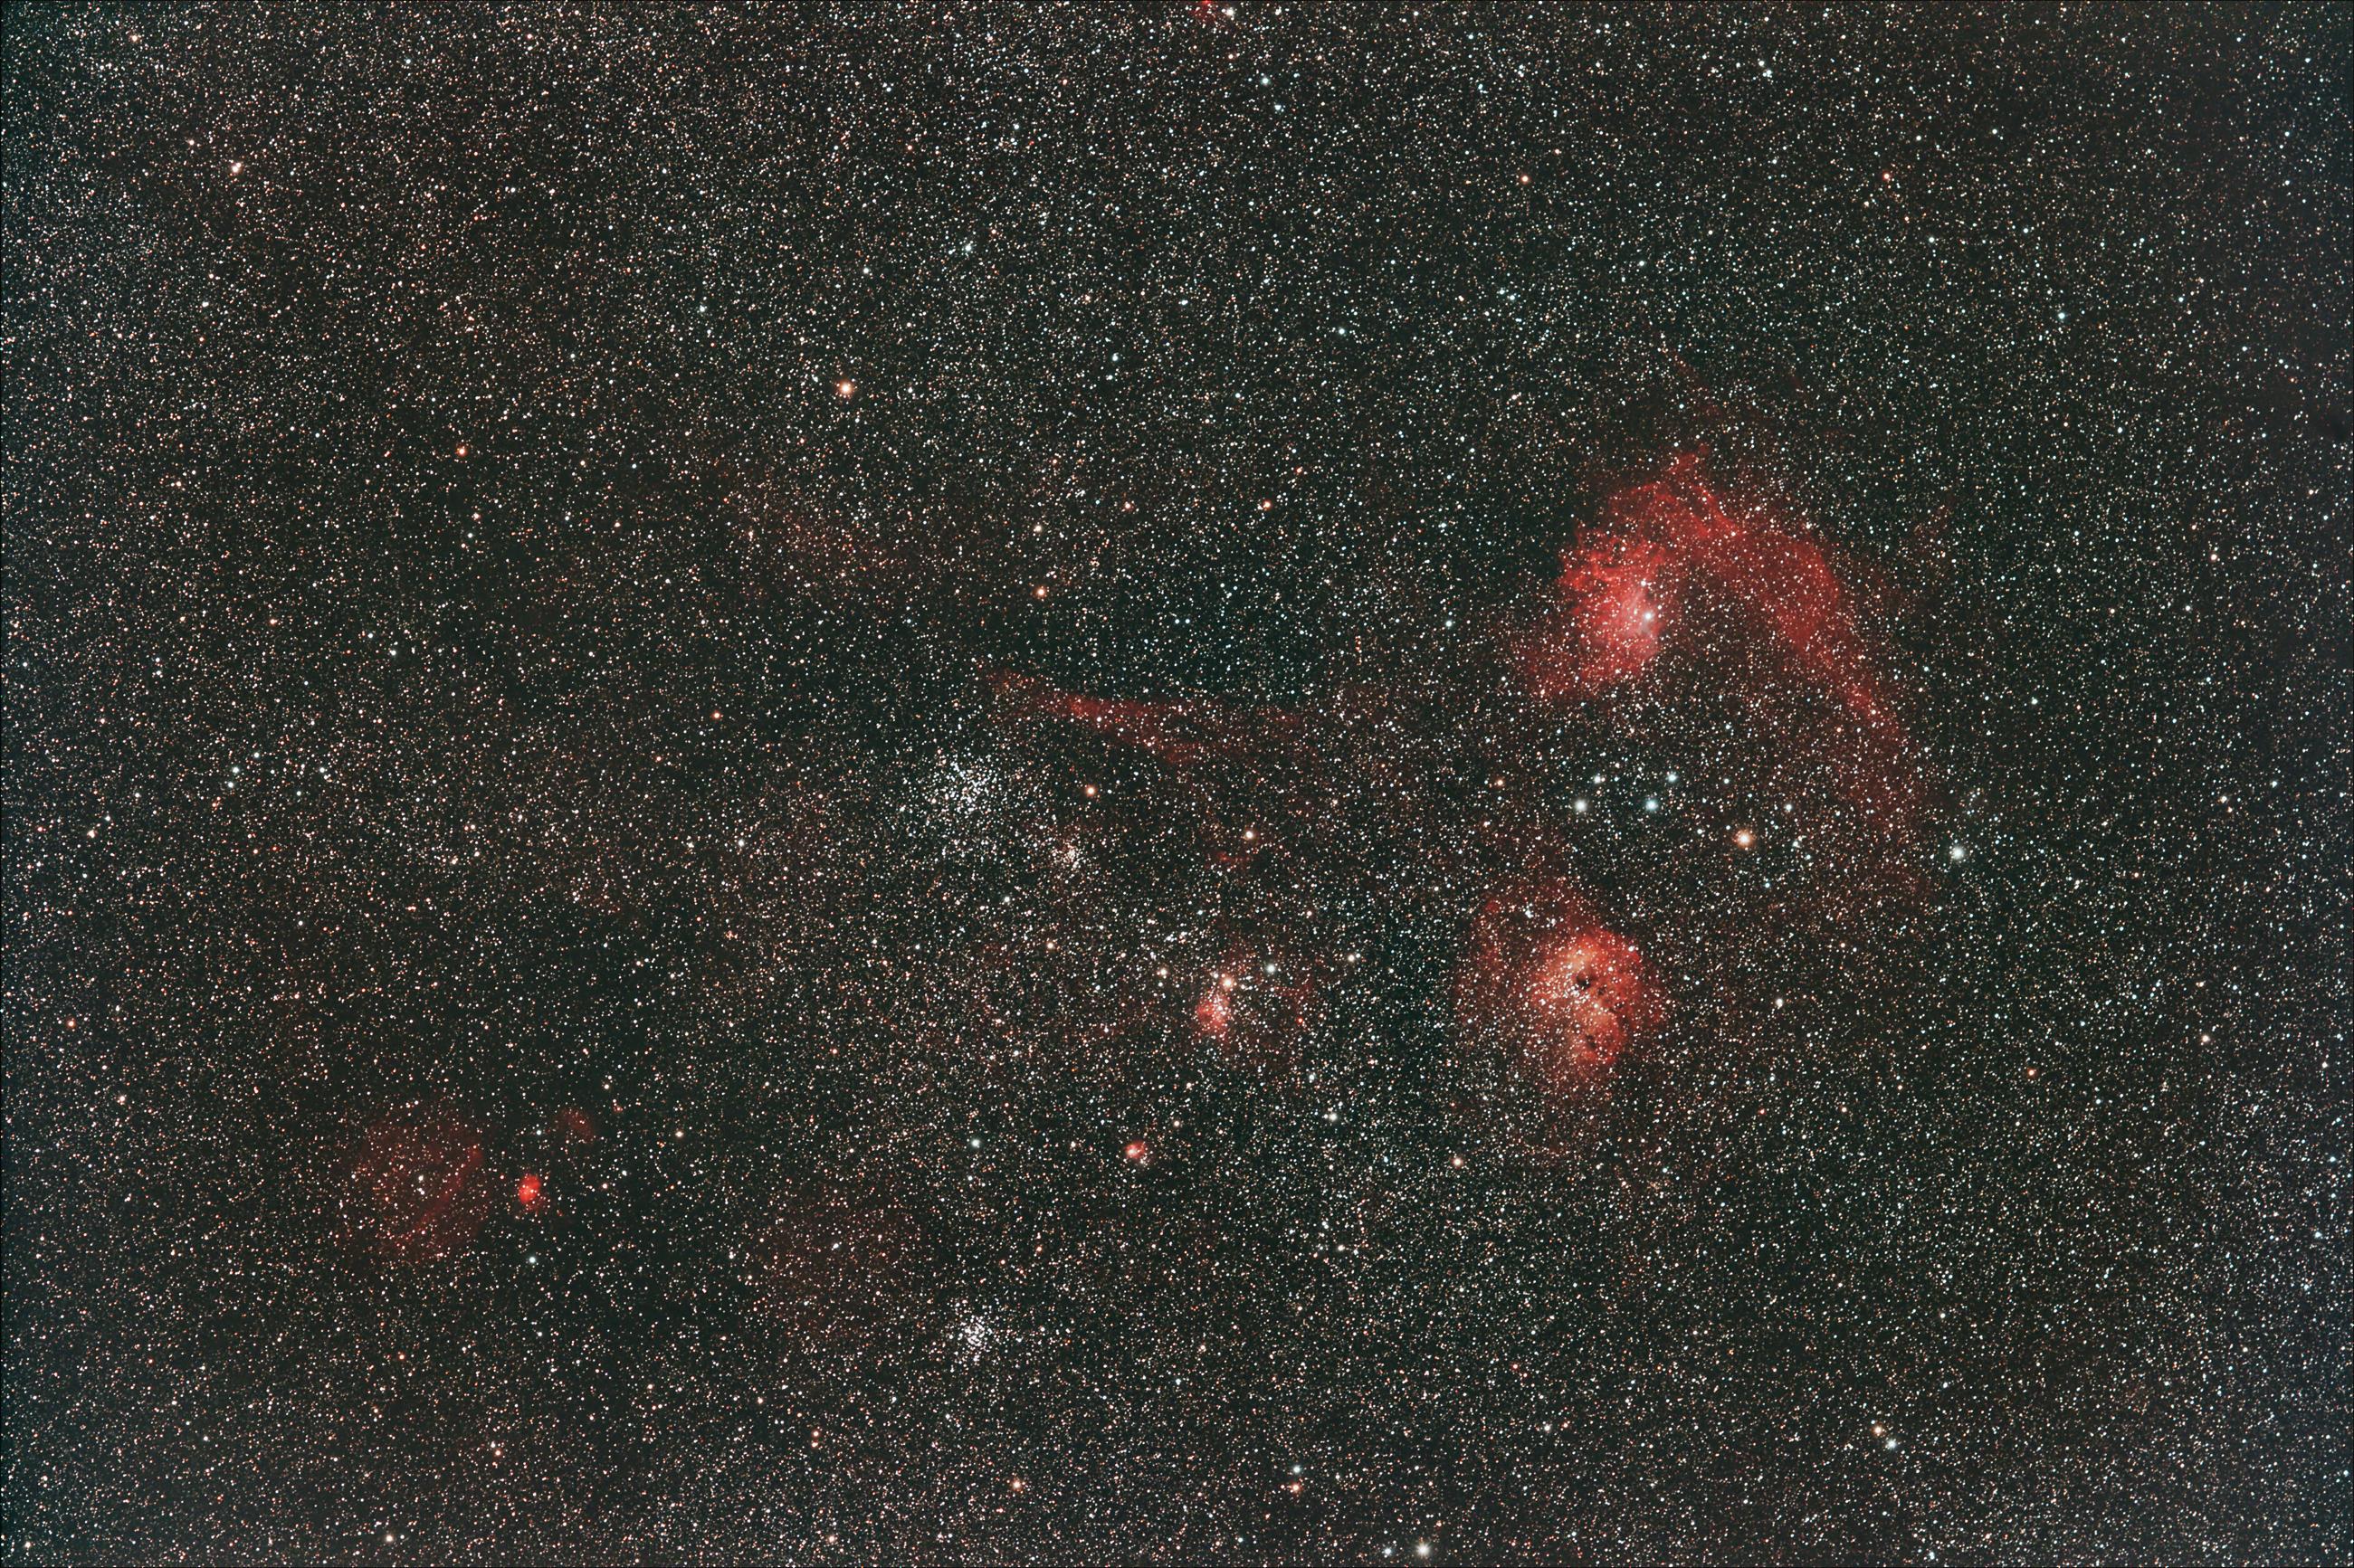 objekte-in-auriga14-1-1847x180sec